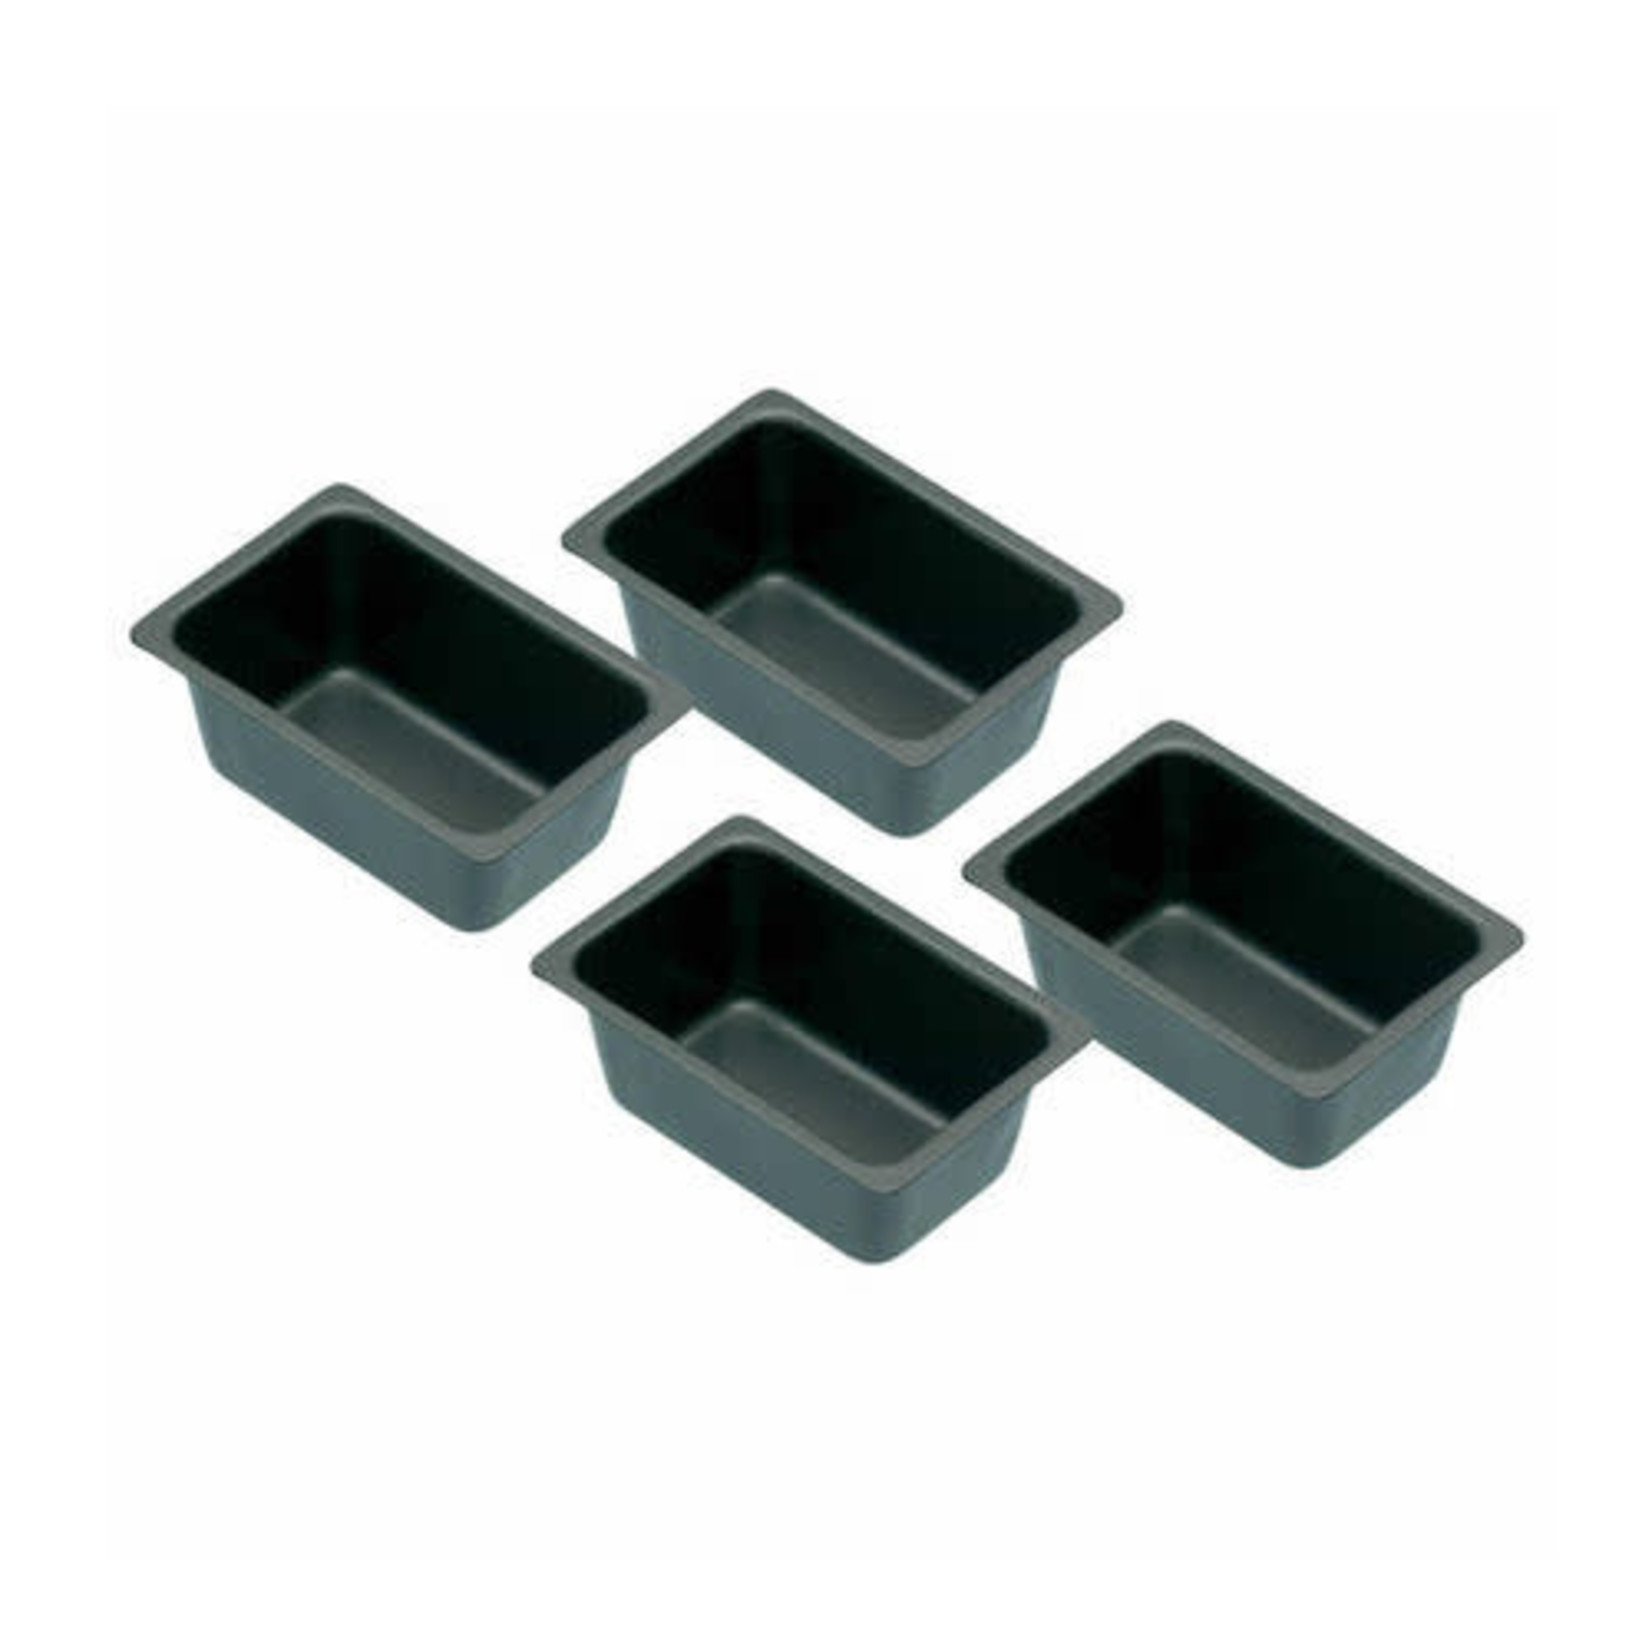 Kitchencraft Cakevorm mini 7x4,5x3cm 4 stuks